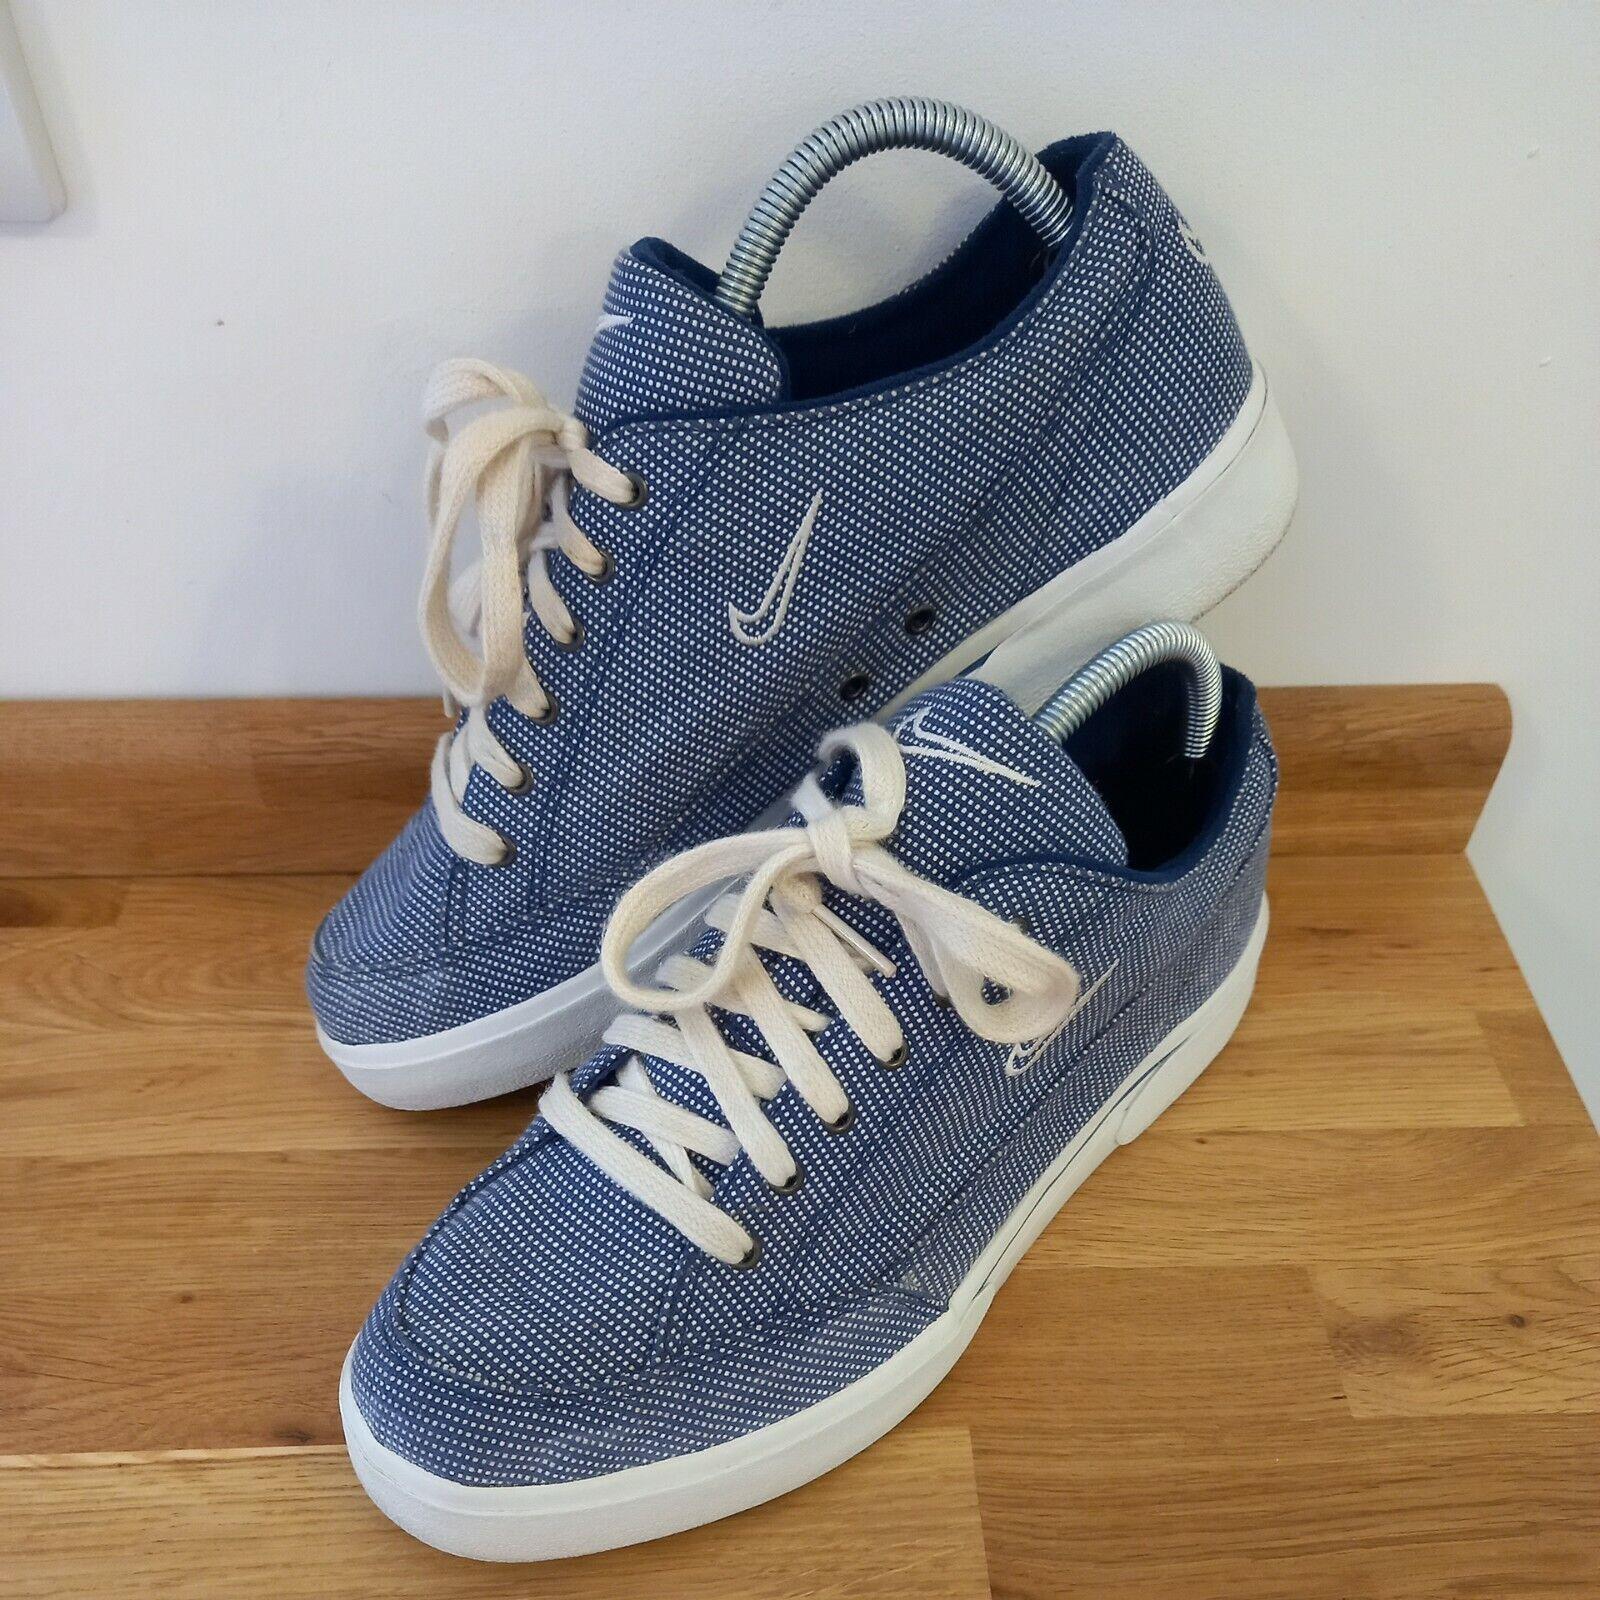 Nike Court GTS Femme Baskets Bleu/blanc carreaux Taille UK7 Chaussures de Tennis